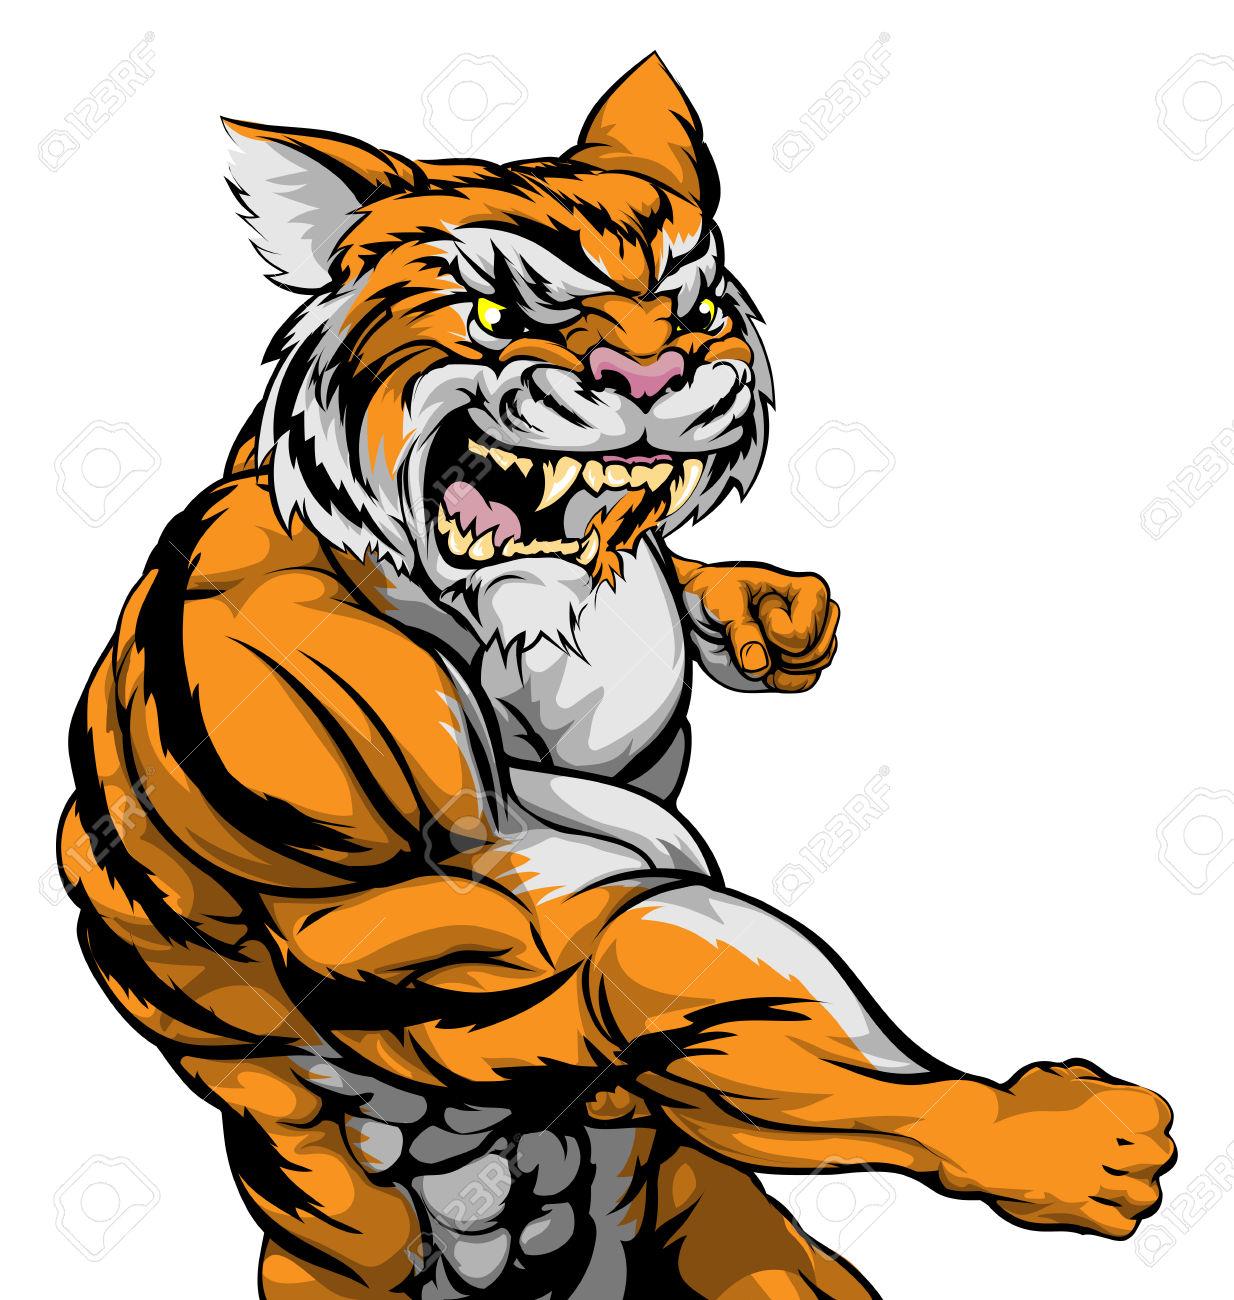 Tigre Bengala clipart #4, Download drawings